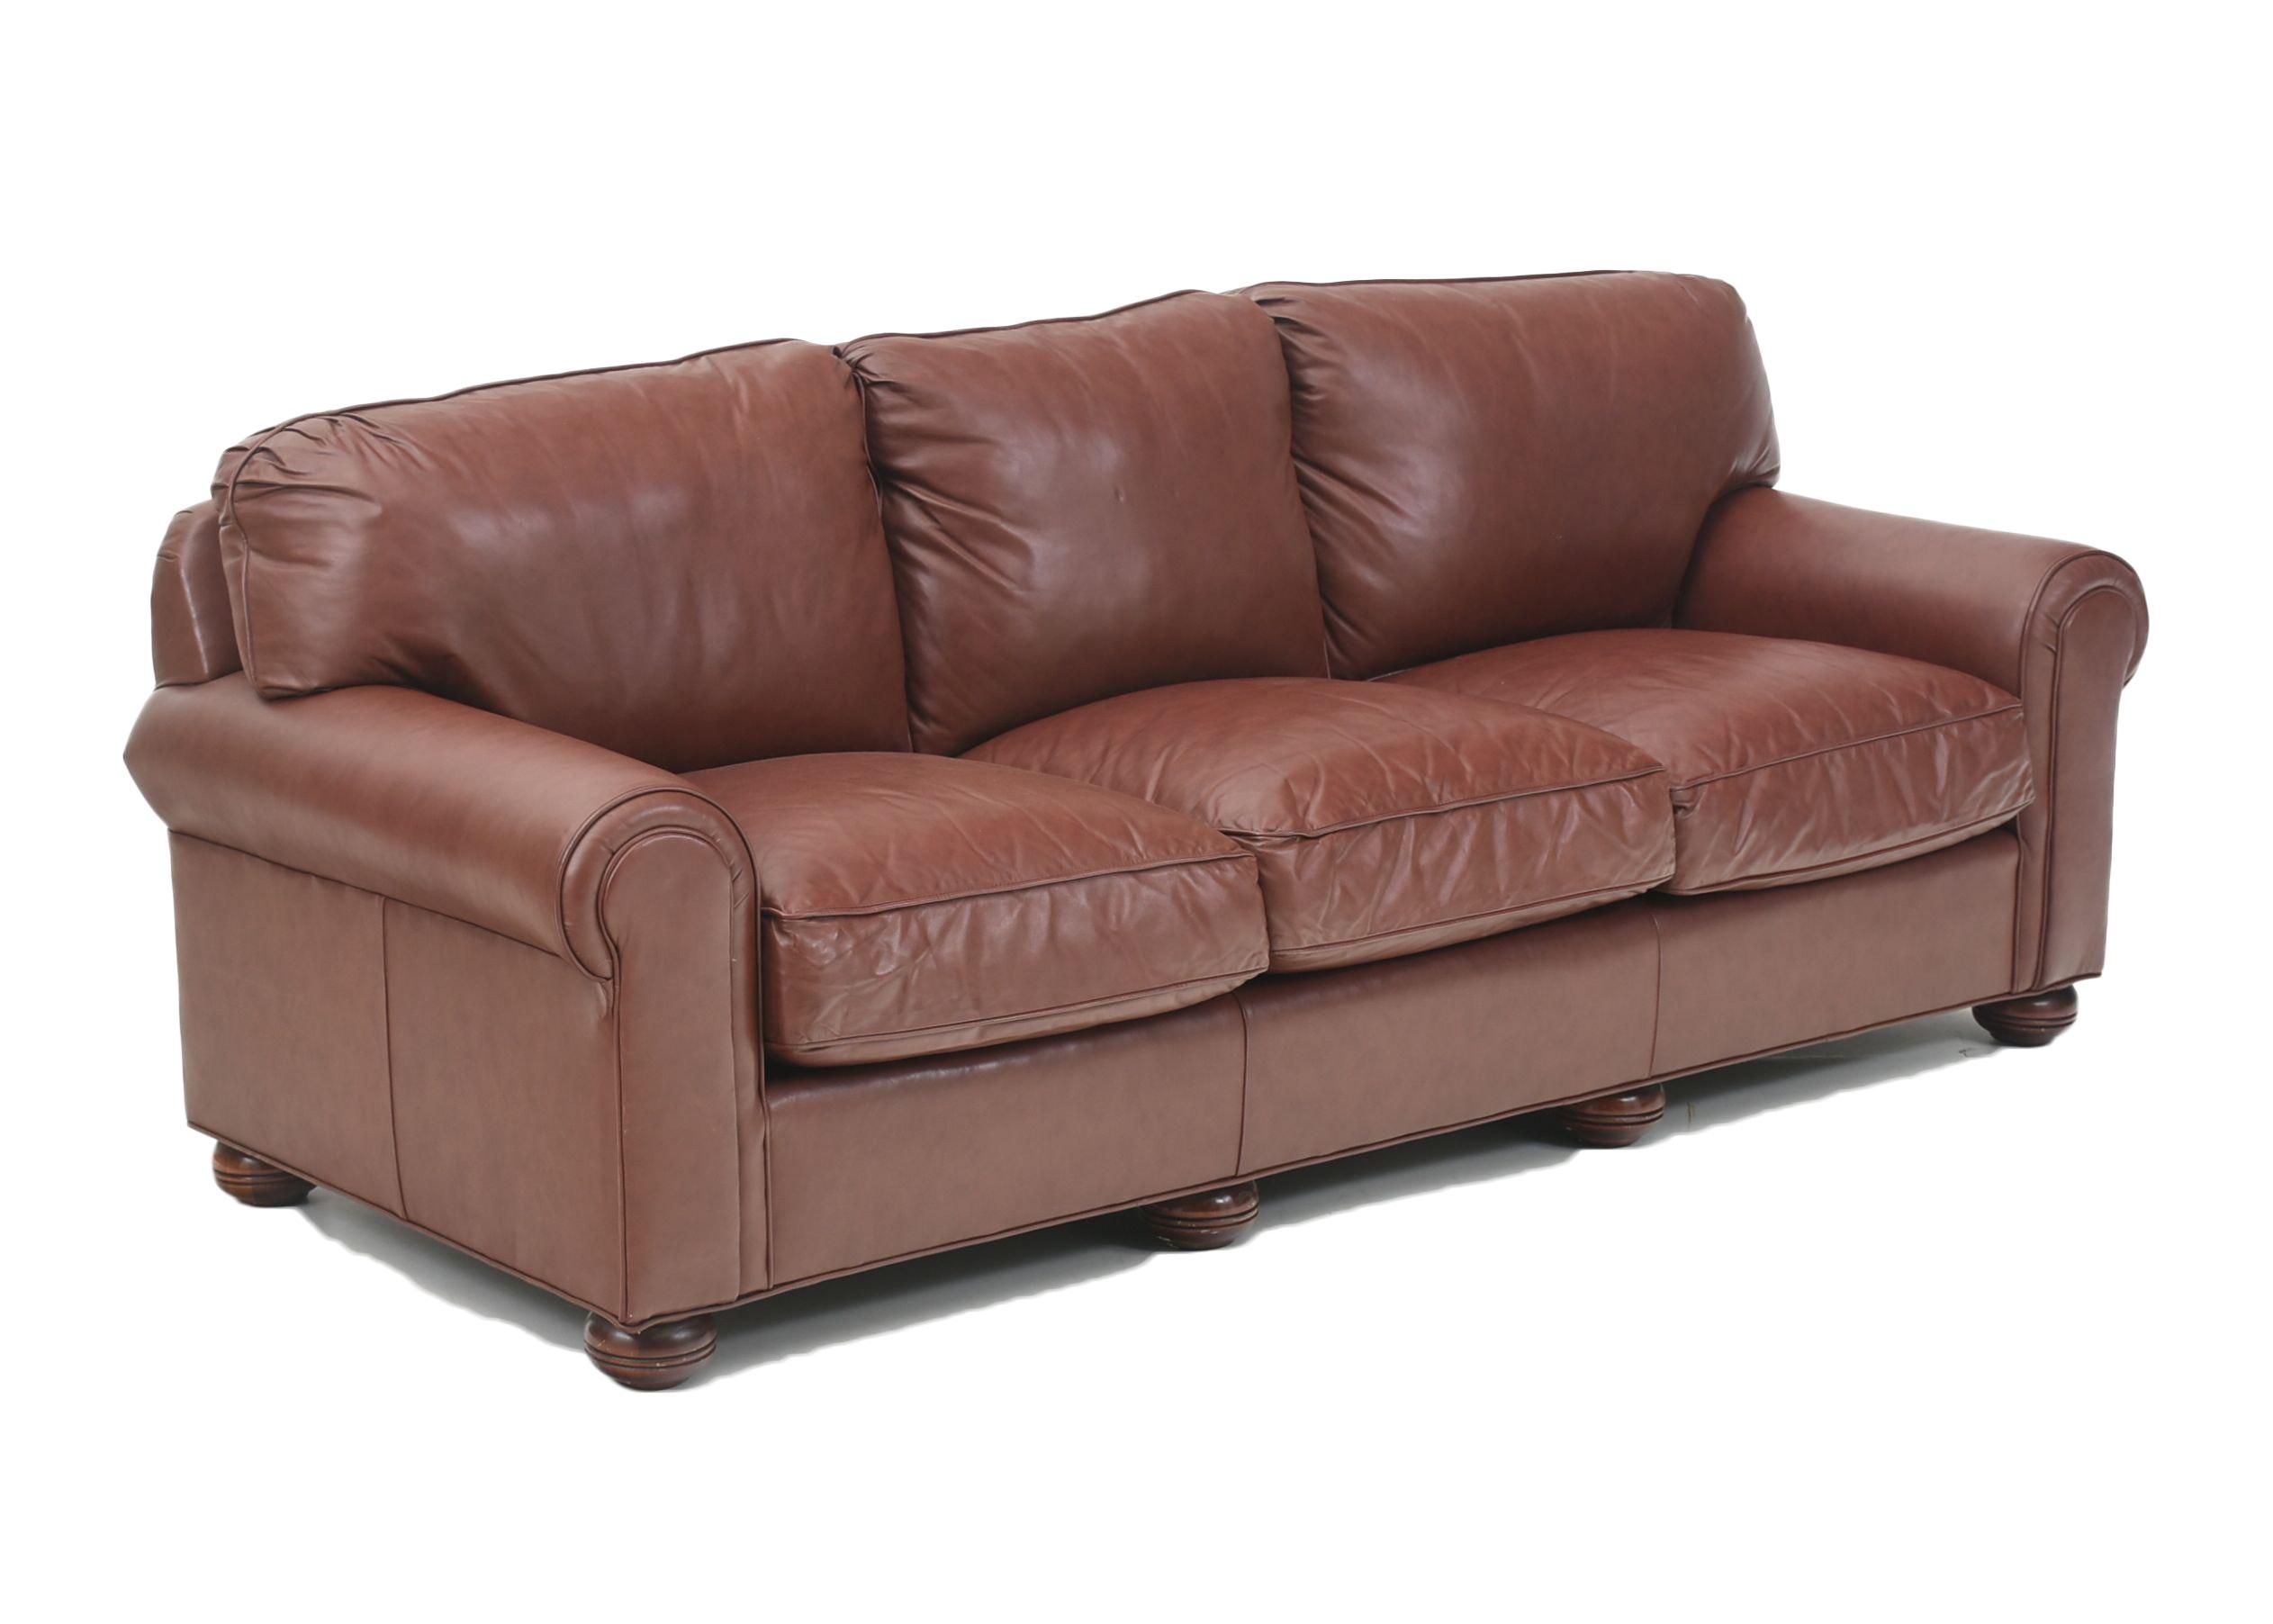 McKinley Leather Bordeaux Leather Sofa ...